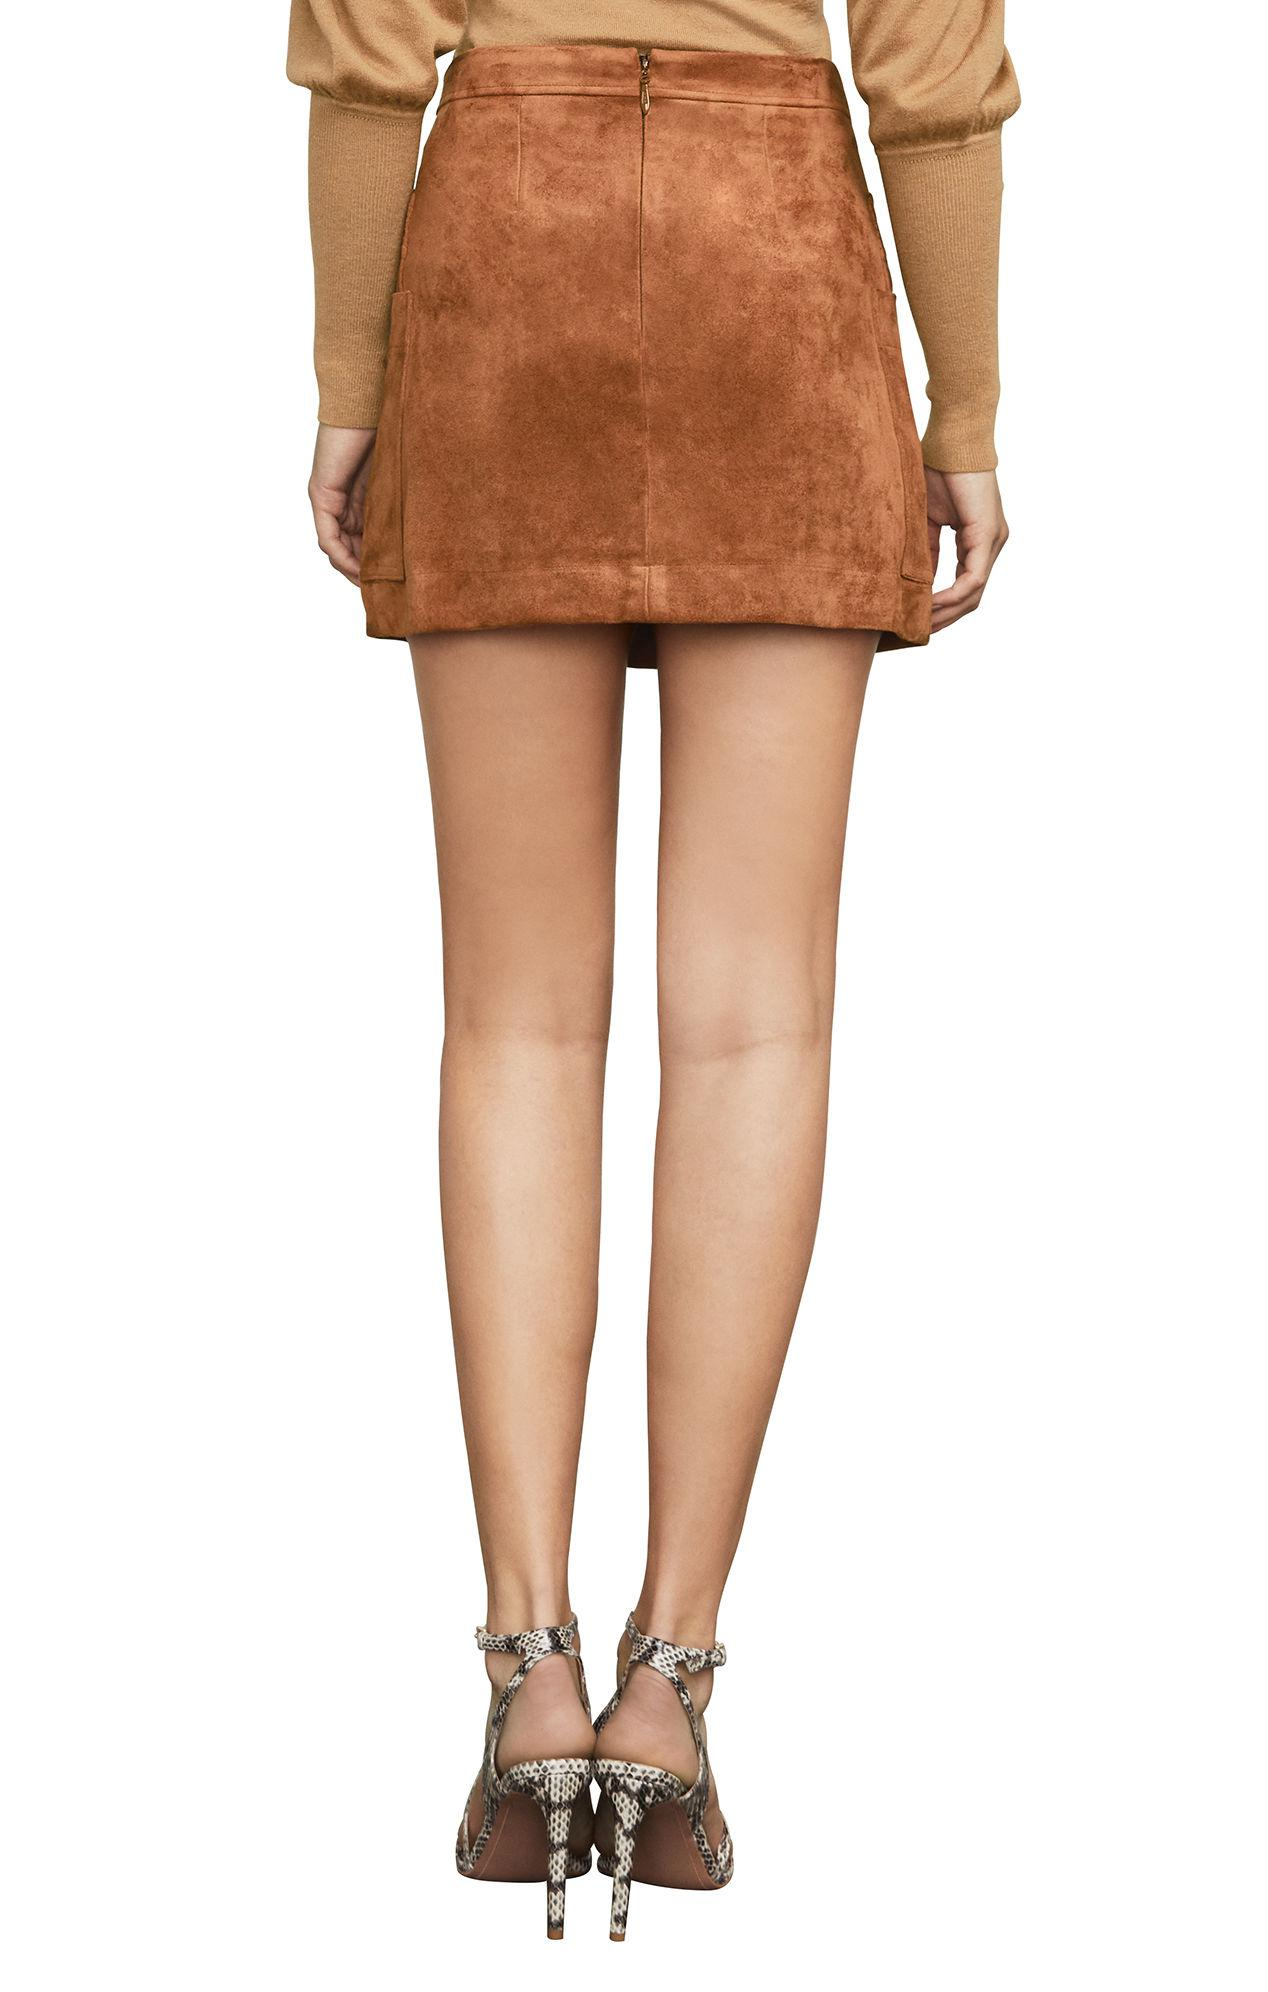 c1e8e2ee12 BCBGMAXAZRIA Bcbg Corinne Faux-suede Mini Skirt in Brown - Lyst